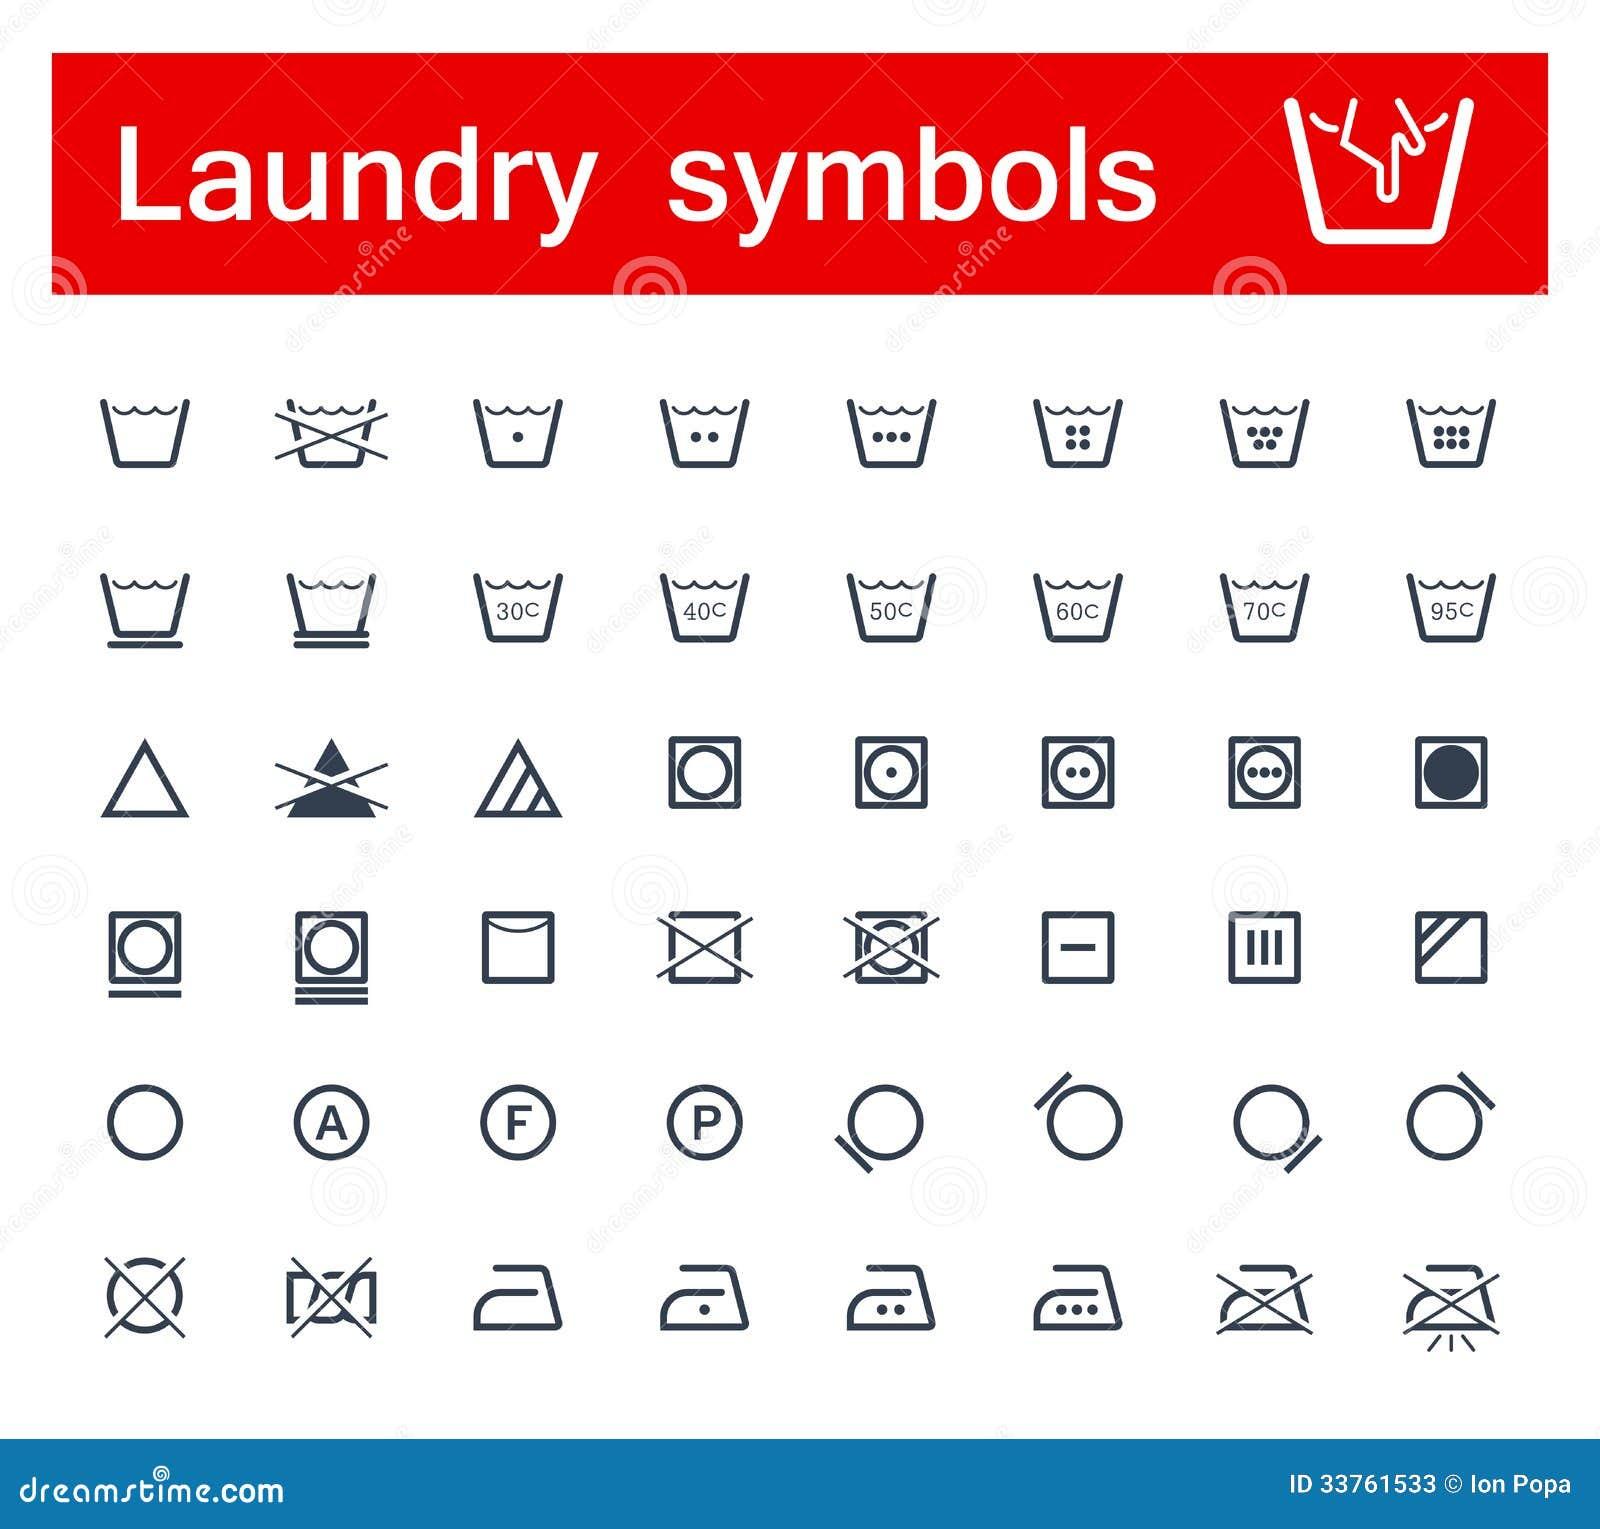 Laundry Symbols Stock Vector Illustration Of Clothing 33761533